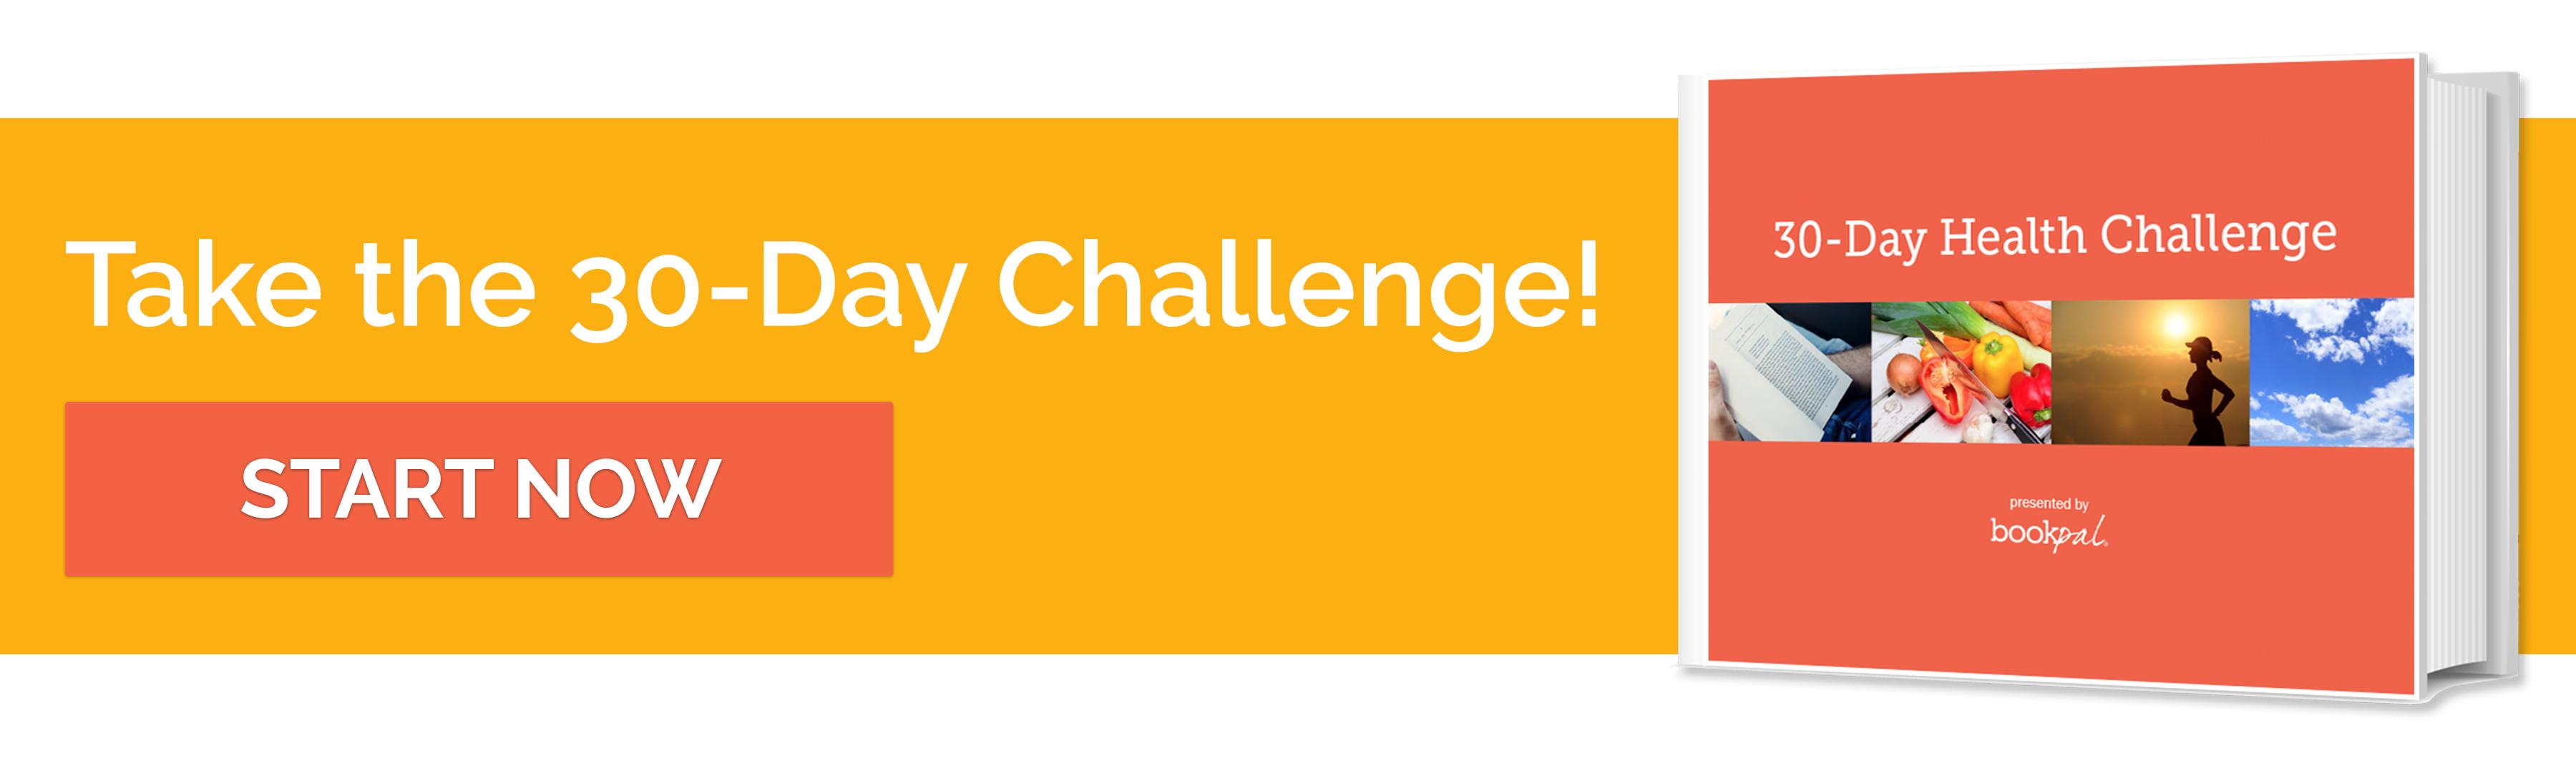 2016 health challenge